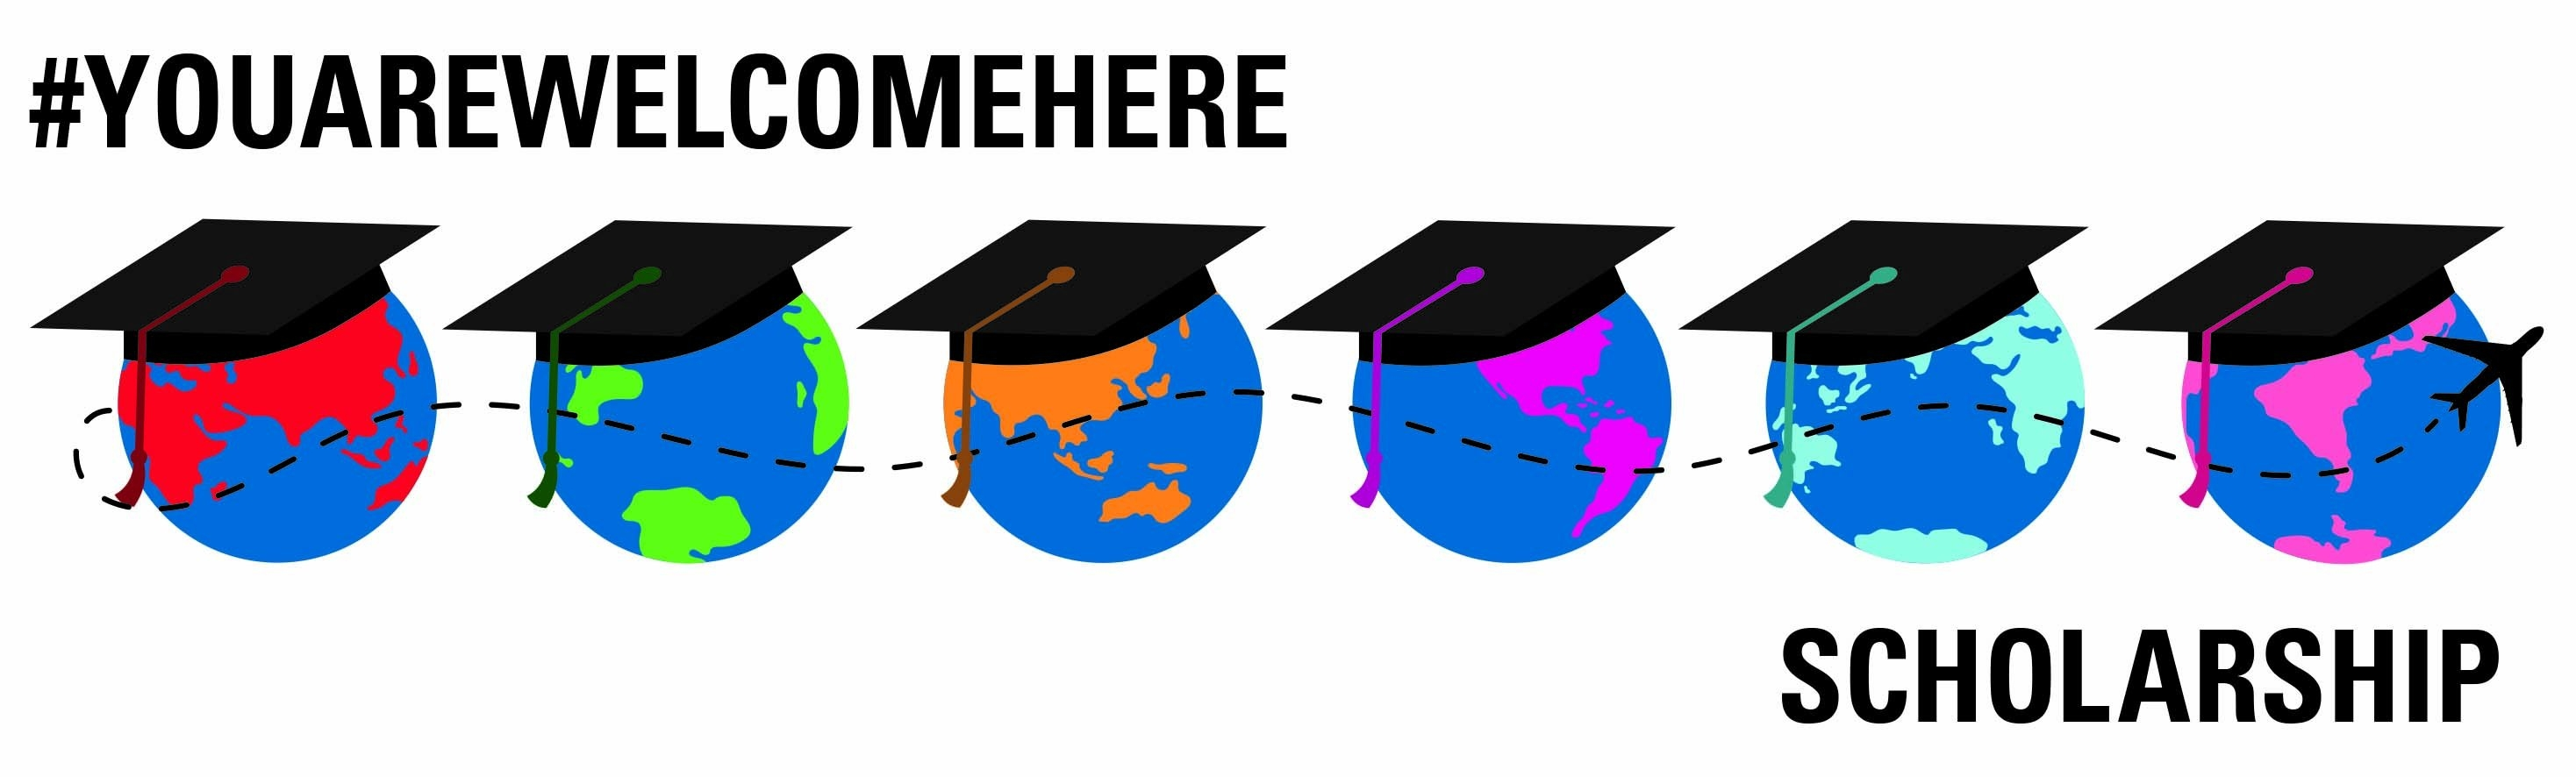 Youarewelcomehere Scholarship – First Year – International Students Seattle U Calendar 2019